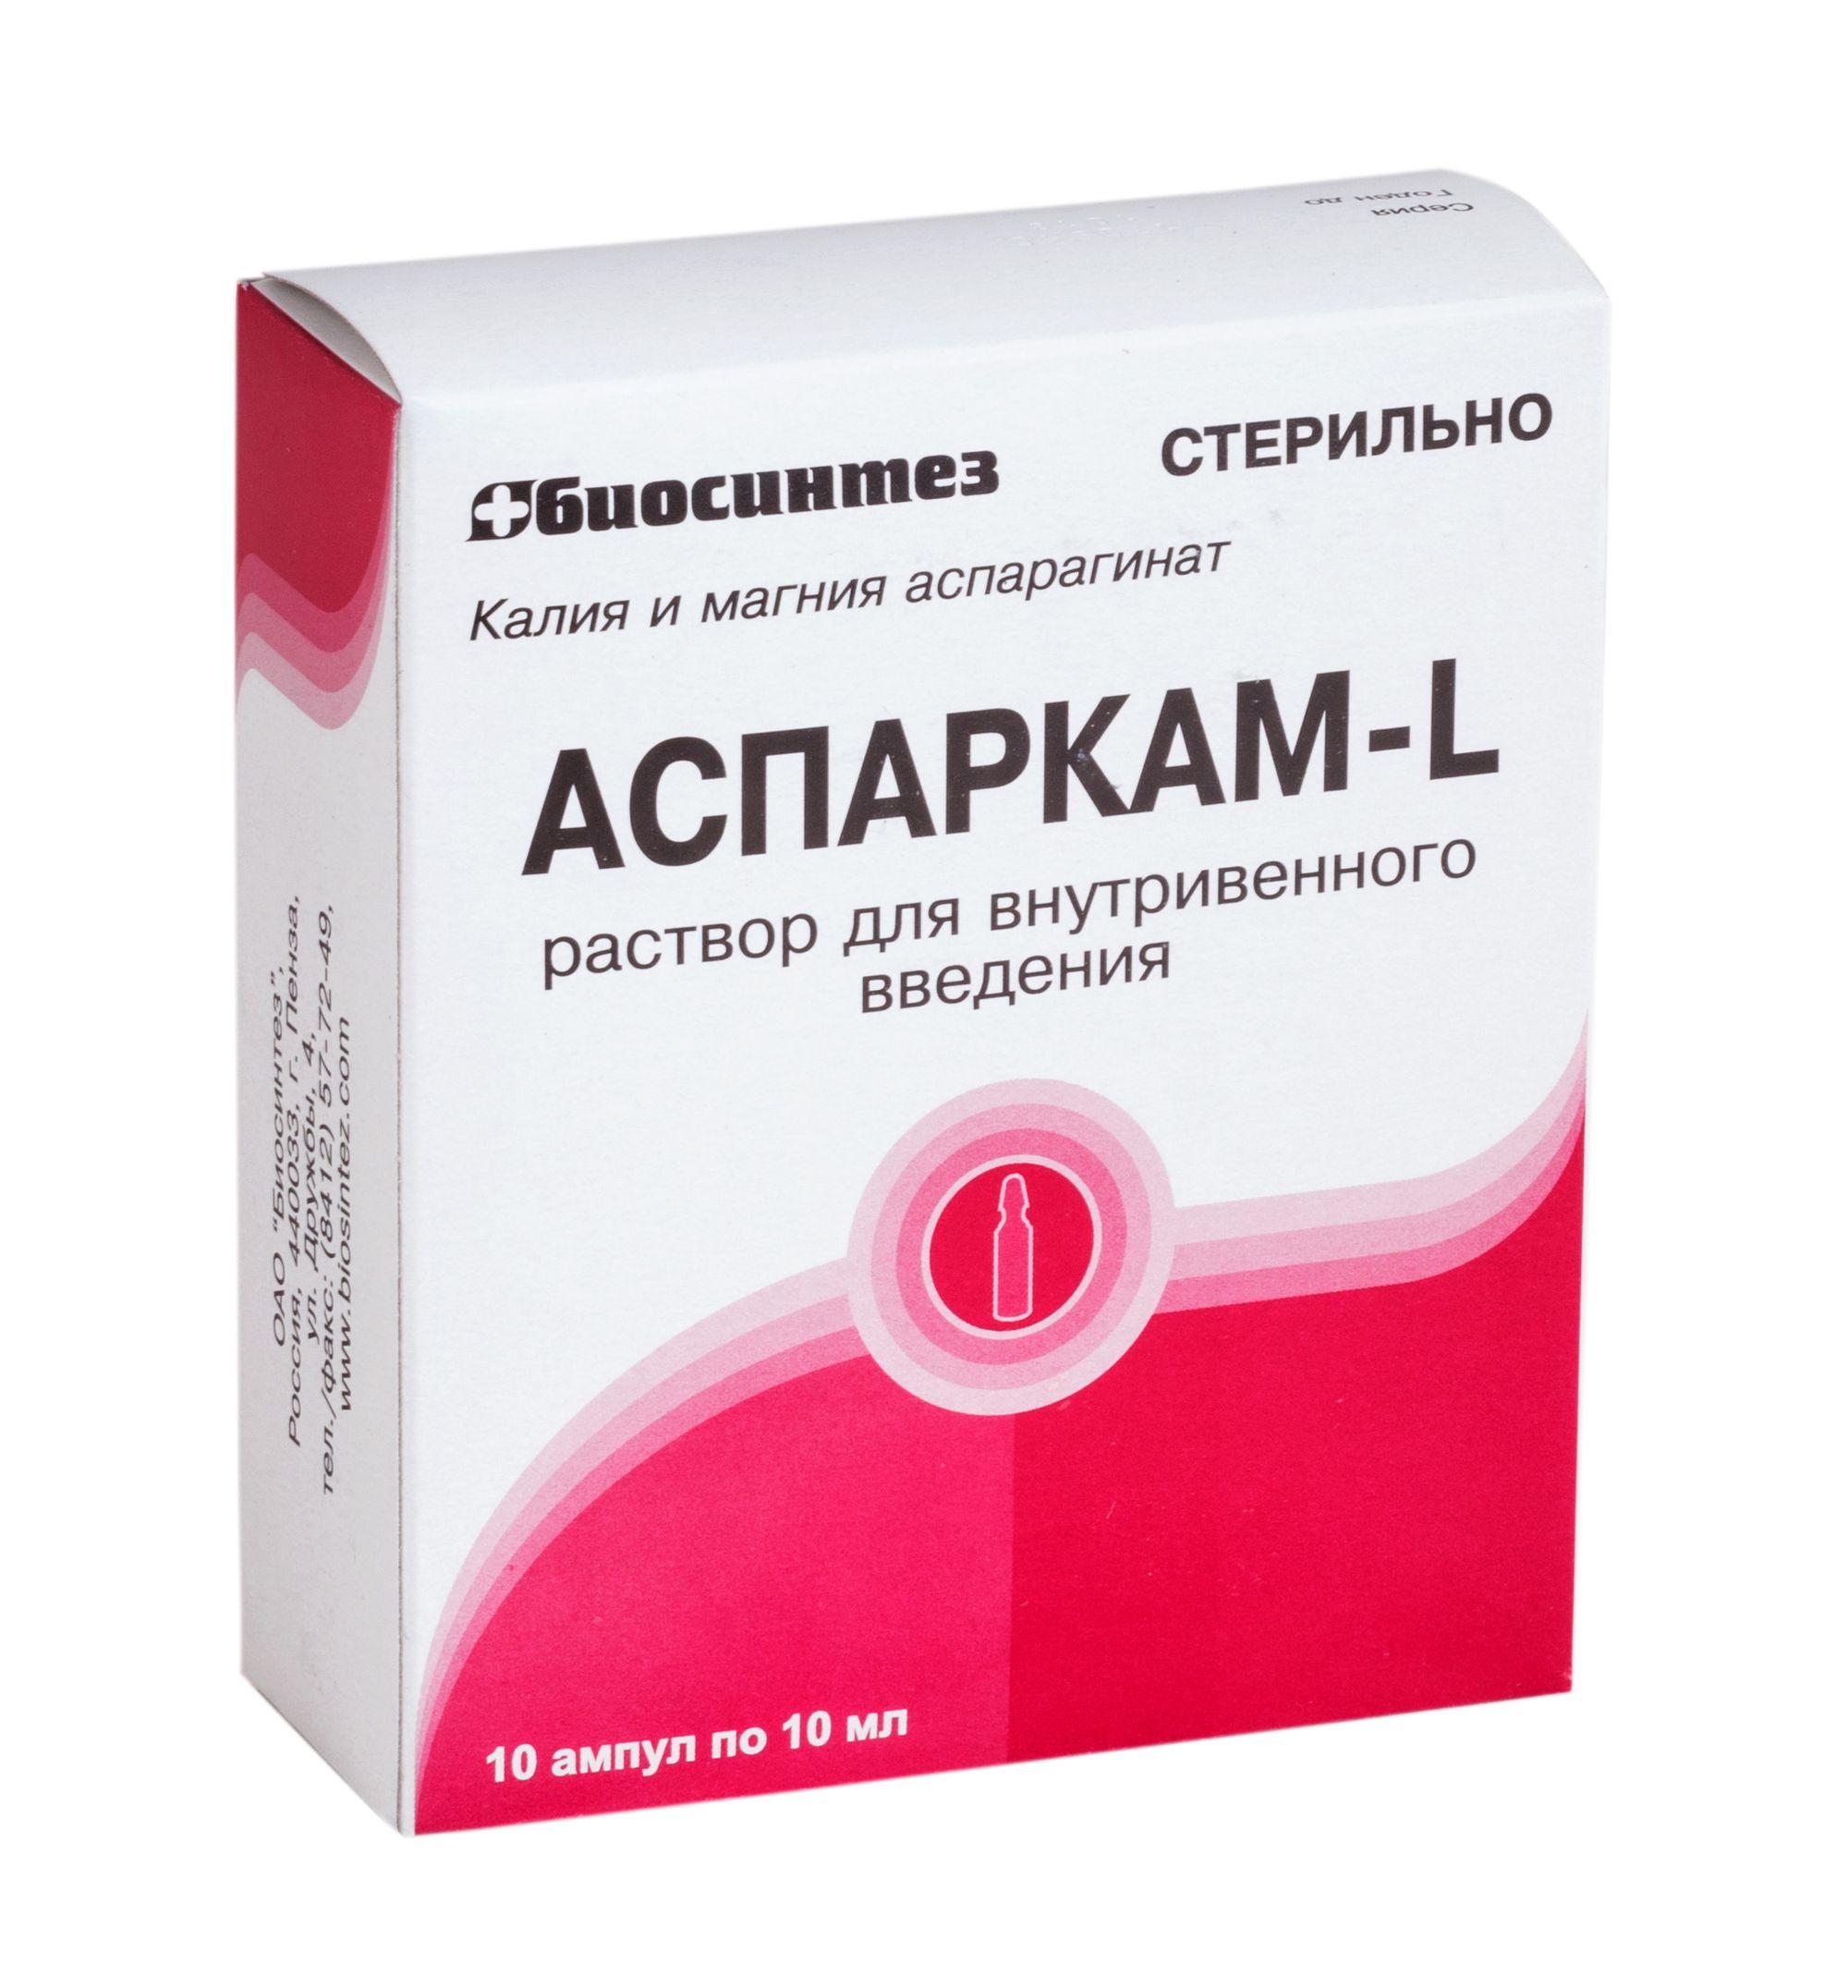 фото упаковки Аспаркам-L